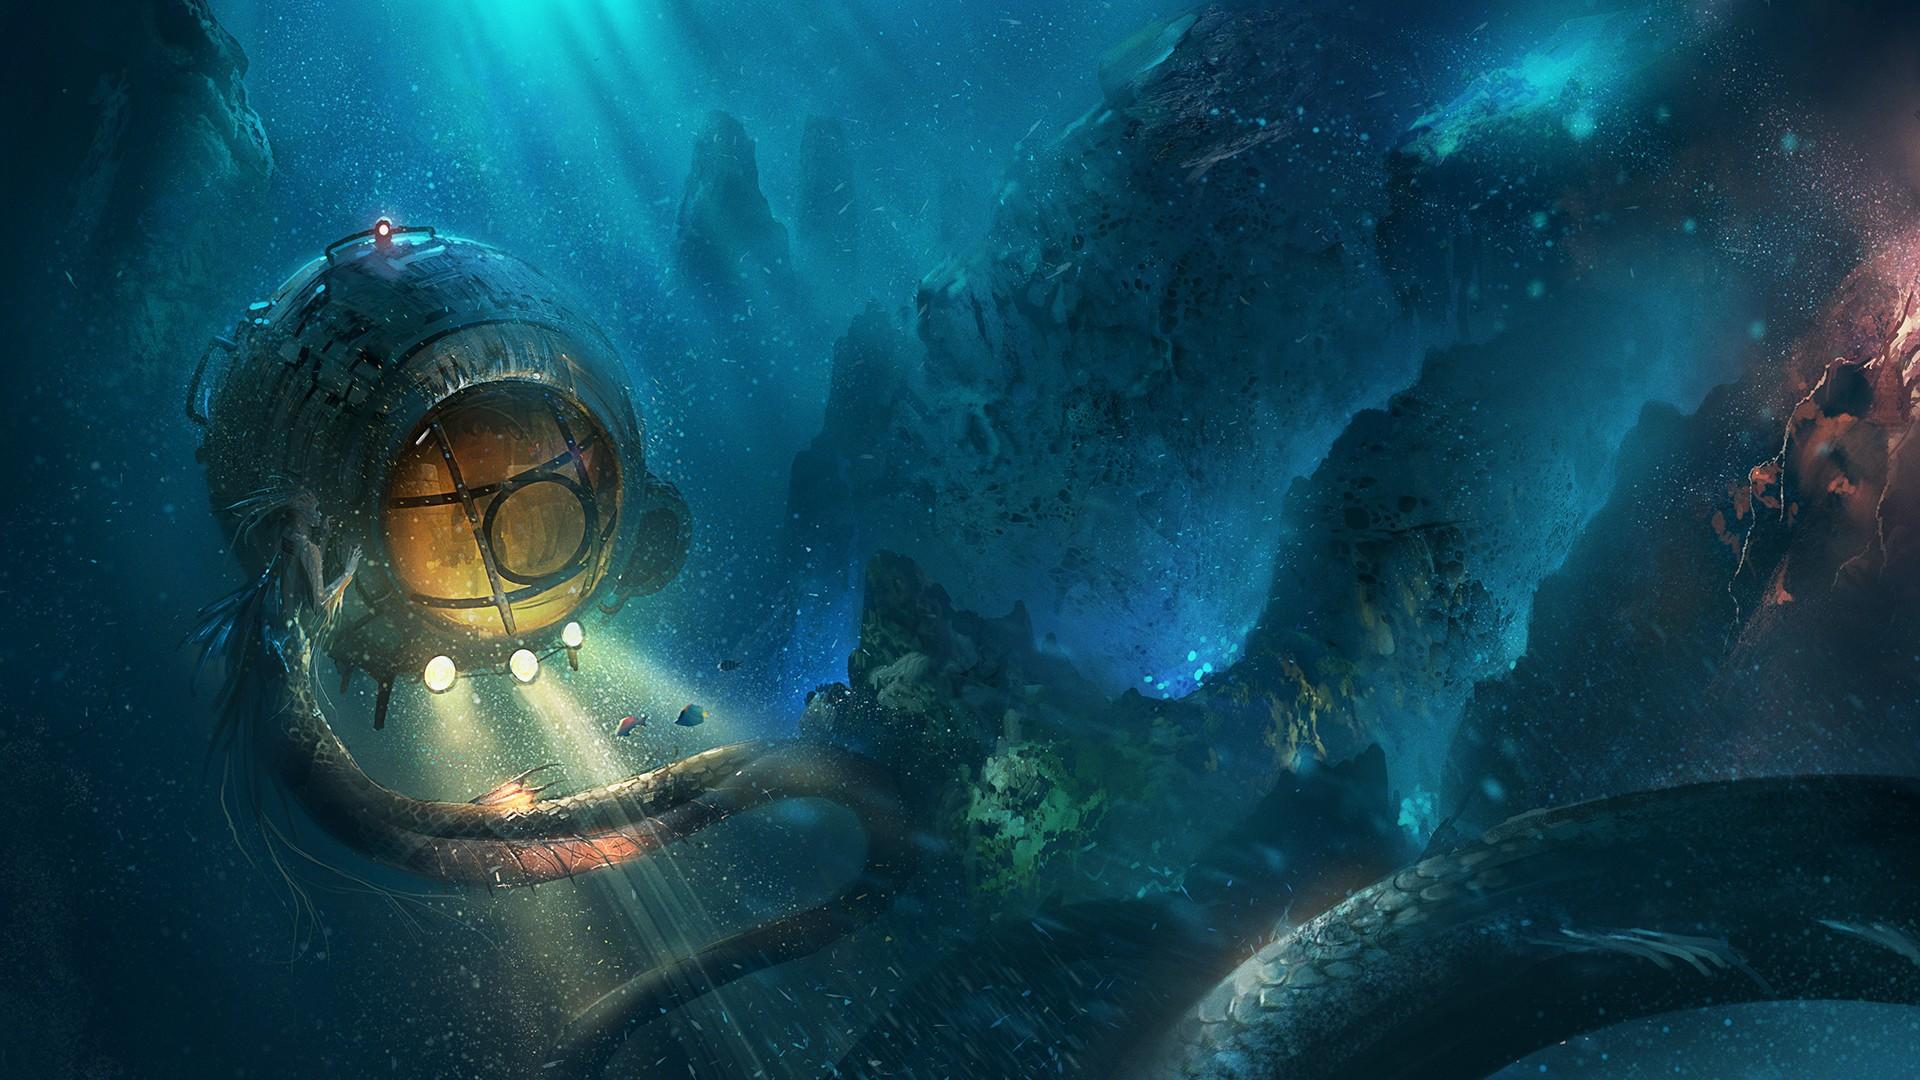 Wallpaper Fantasy Art Artwork Underwater Ocean Reef